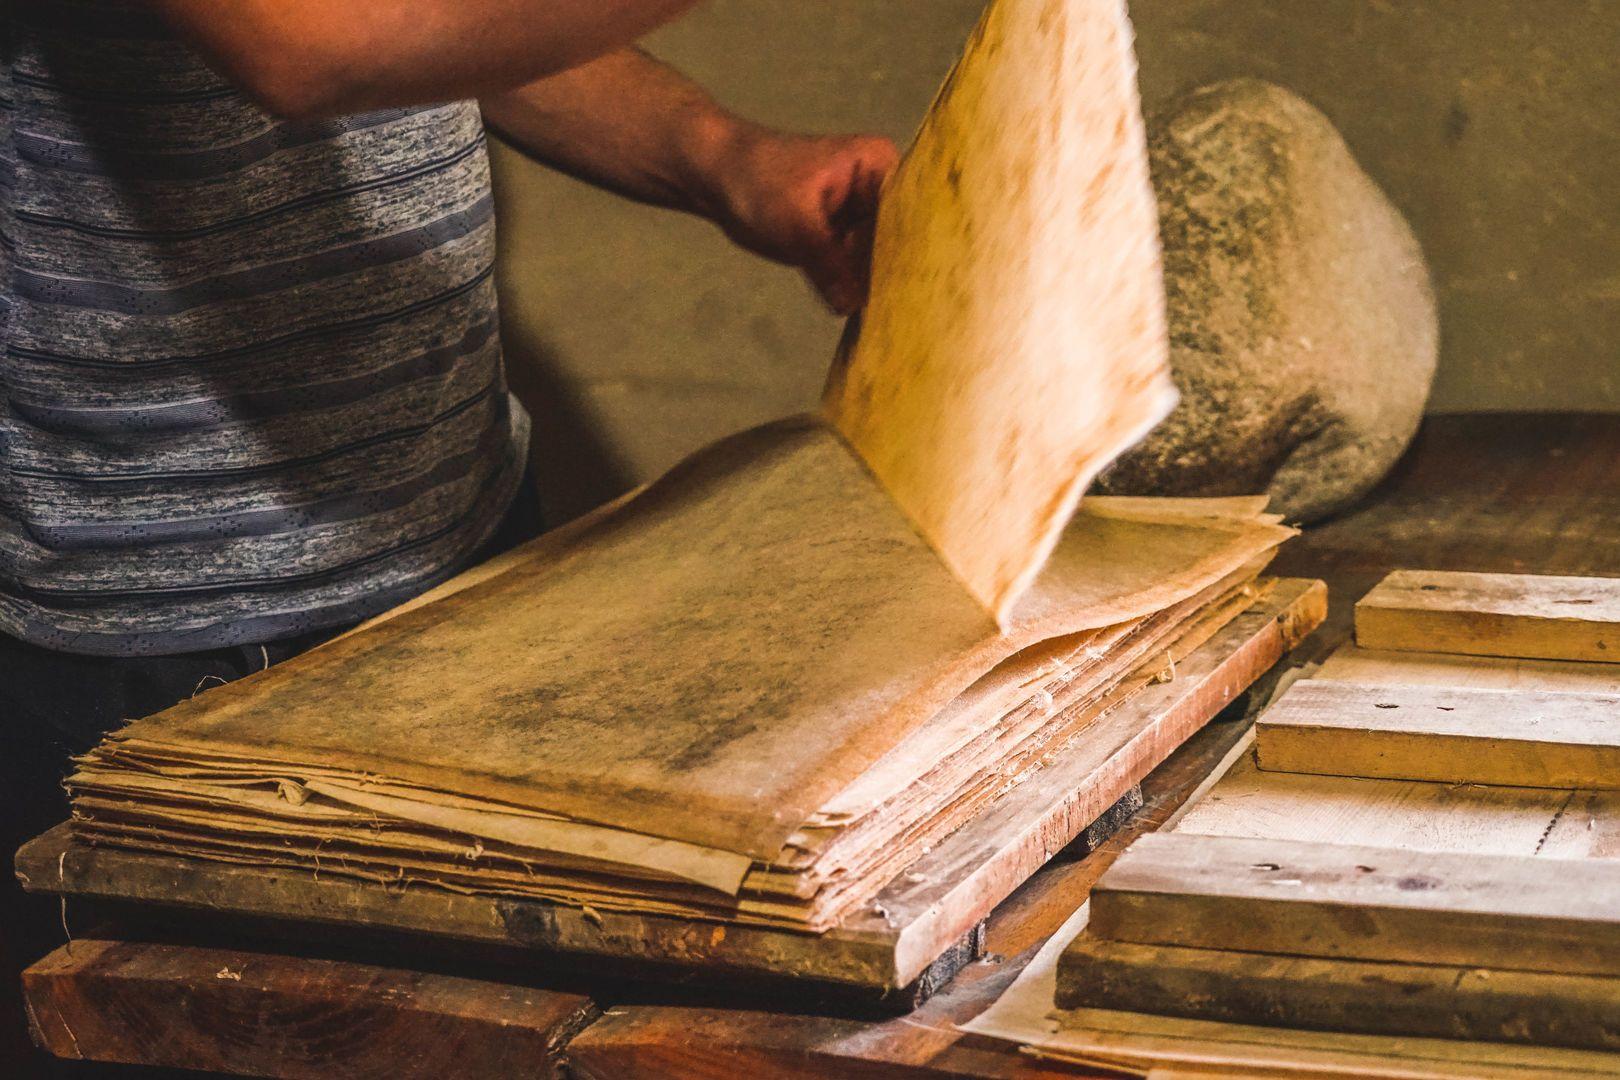 Samarkand papermaking tradition